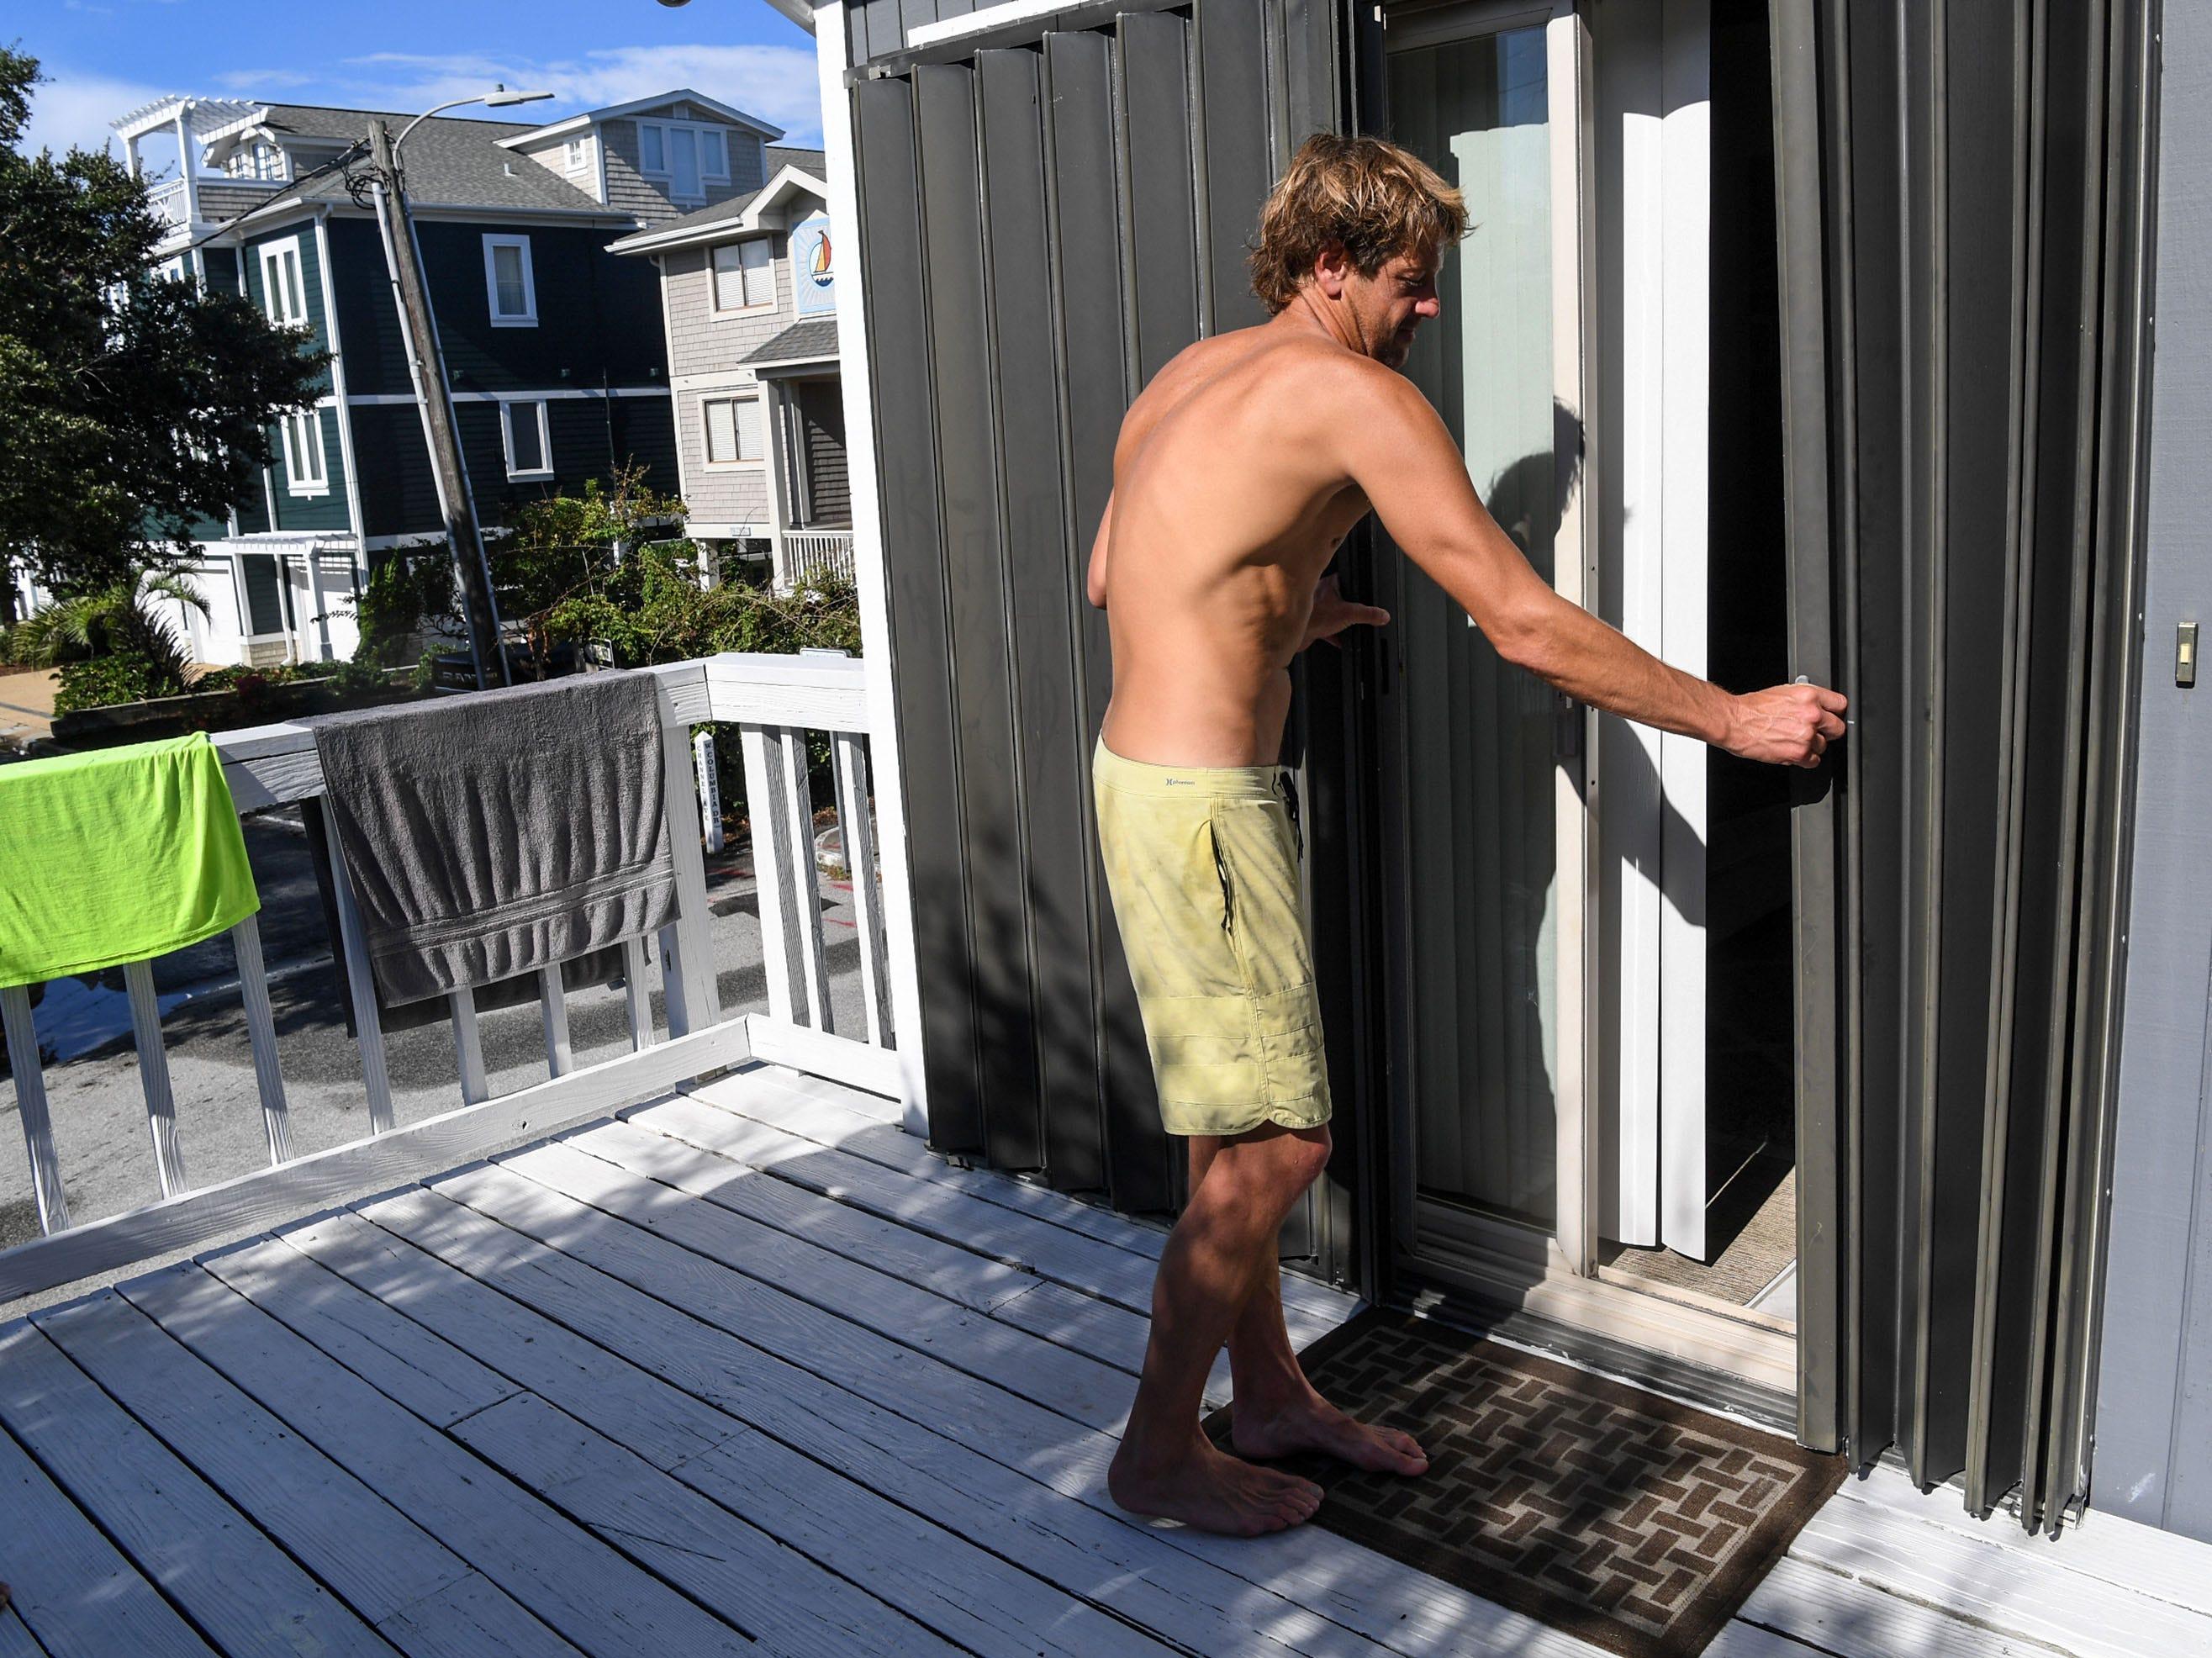 Austin Parker slides hurricane shutters at his apartment at Wrigtsville Beach in Wilmington, North Carolina on Wednesday, September 12, 2018.  (Ken Ruinard / Greenville News / Gannett USA Today Network / 2018 )